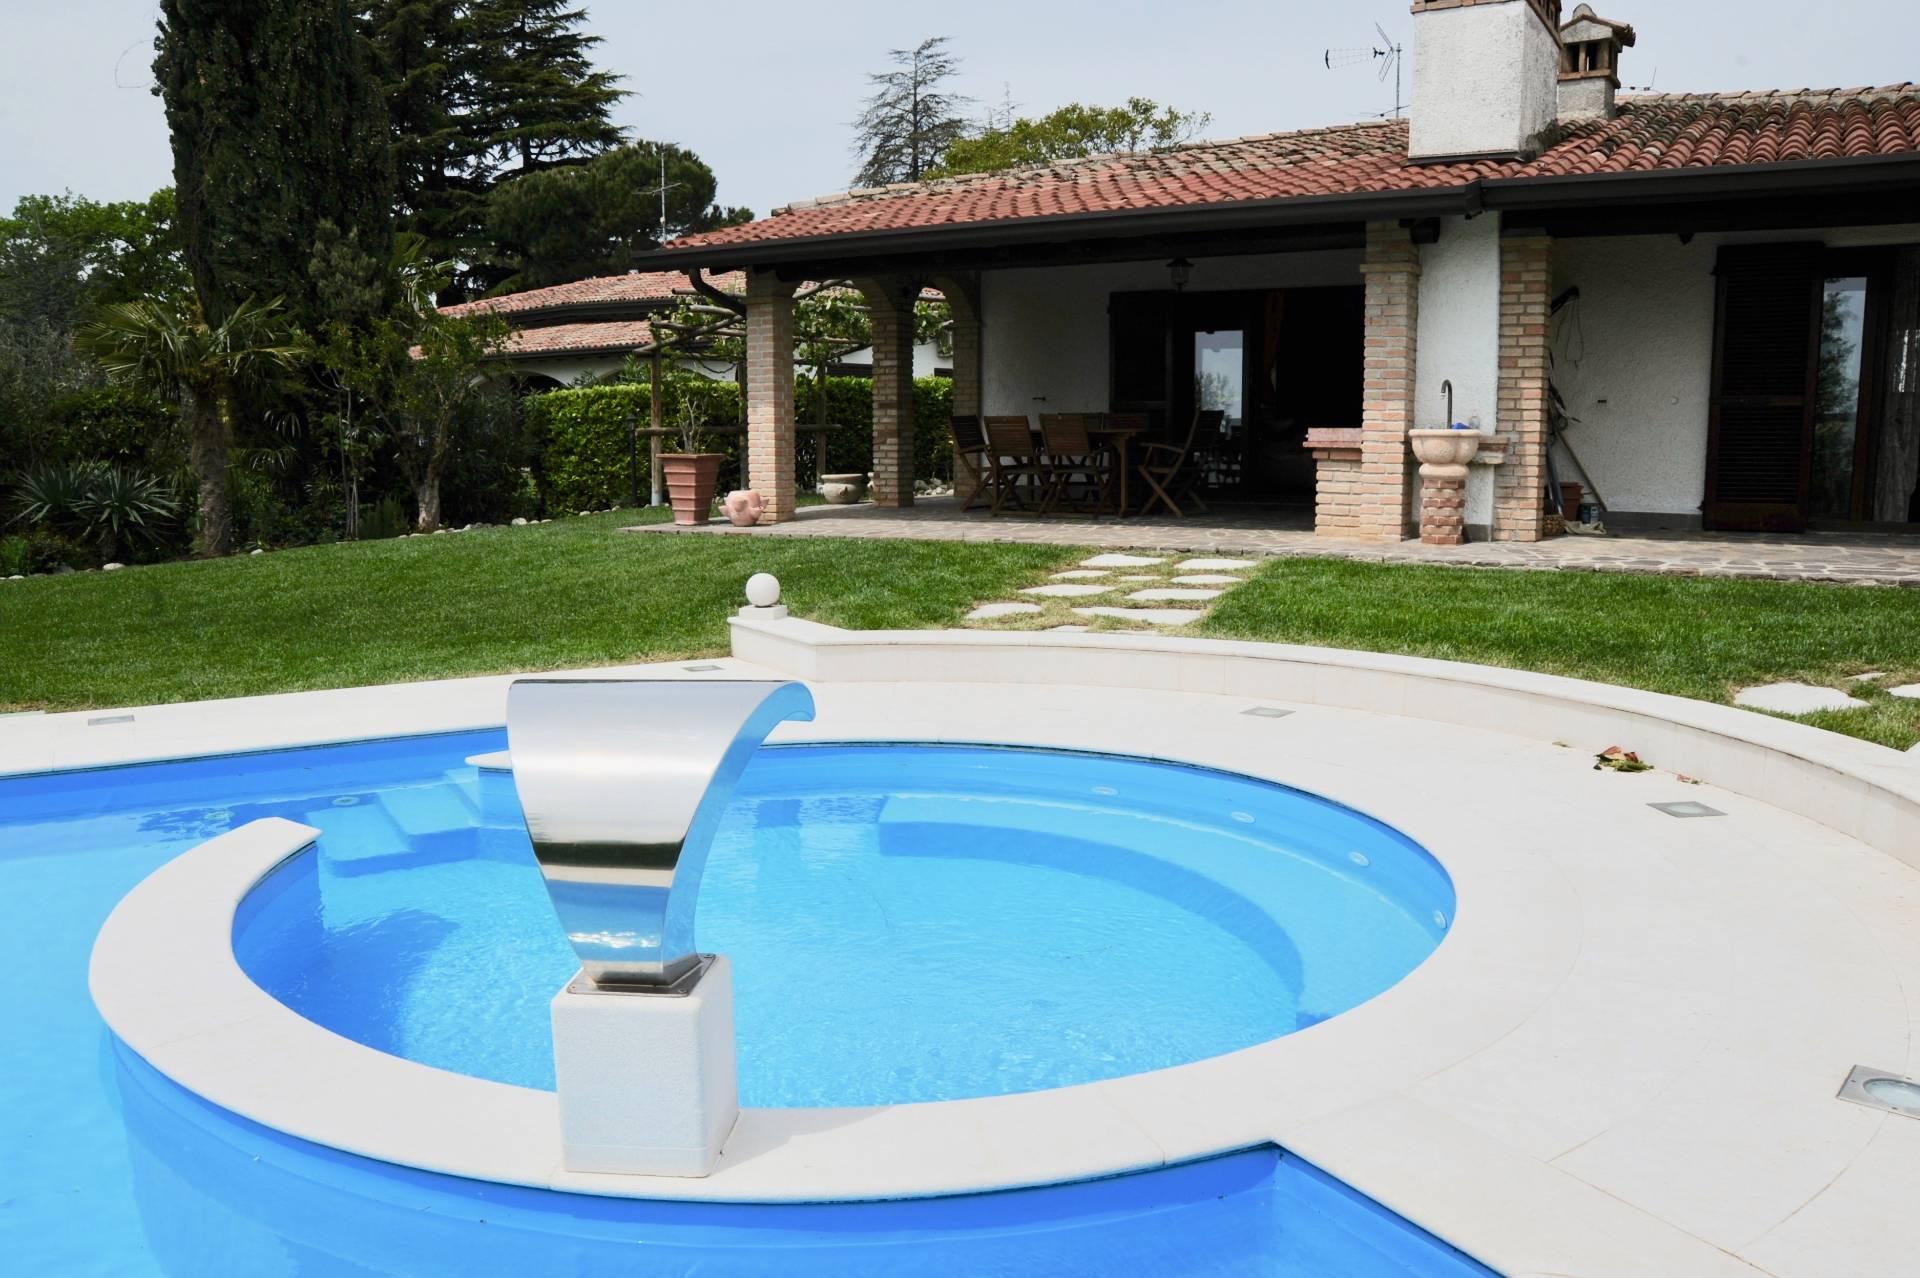 Villa in Vendita a Padenghe Sul Garda: 3 locali, 100 mq - Foto 2